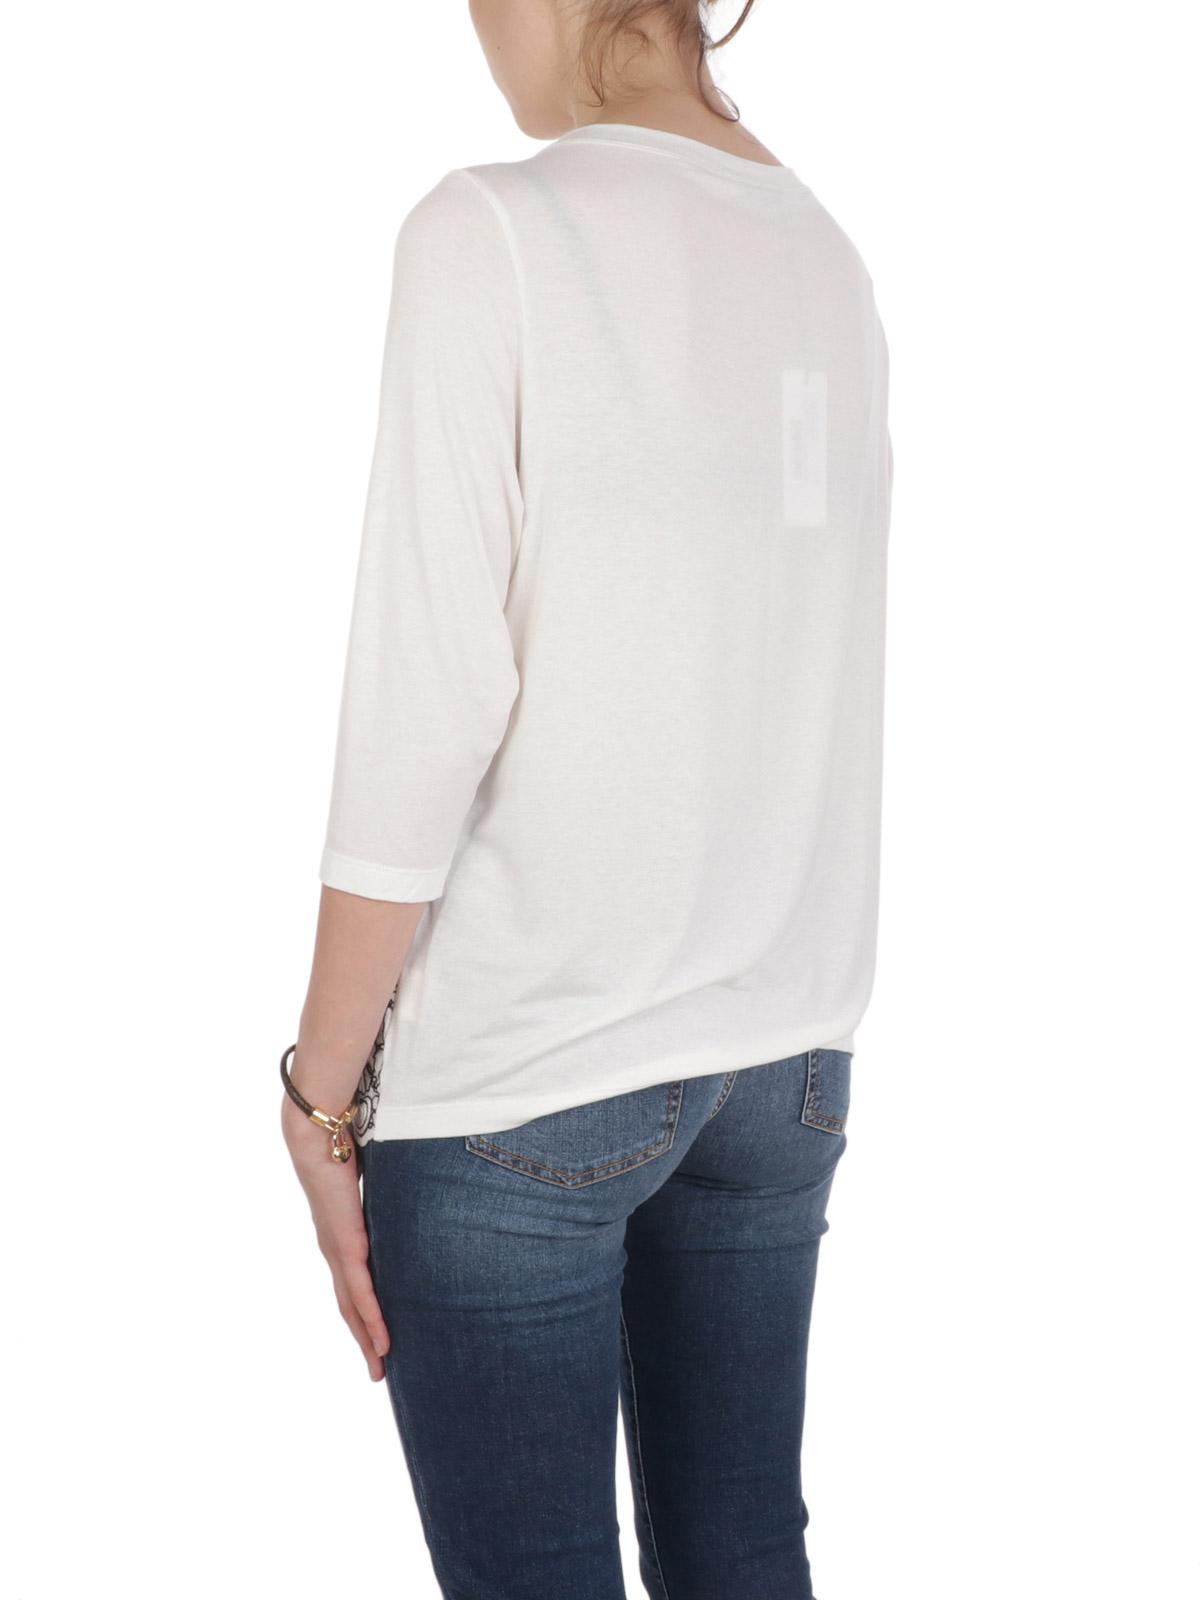 Immagine di Whyci | T-Shirt Tshirt Ricamo